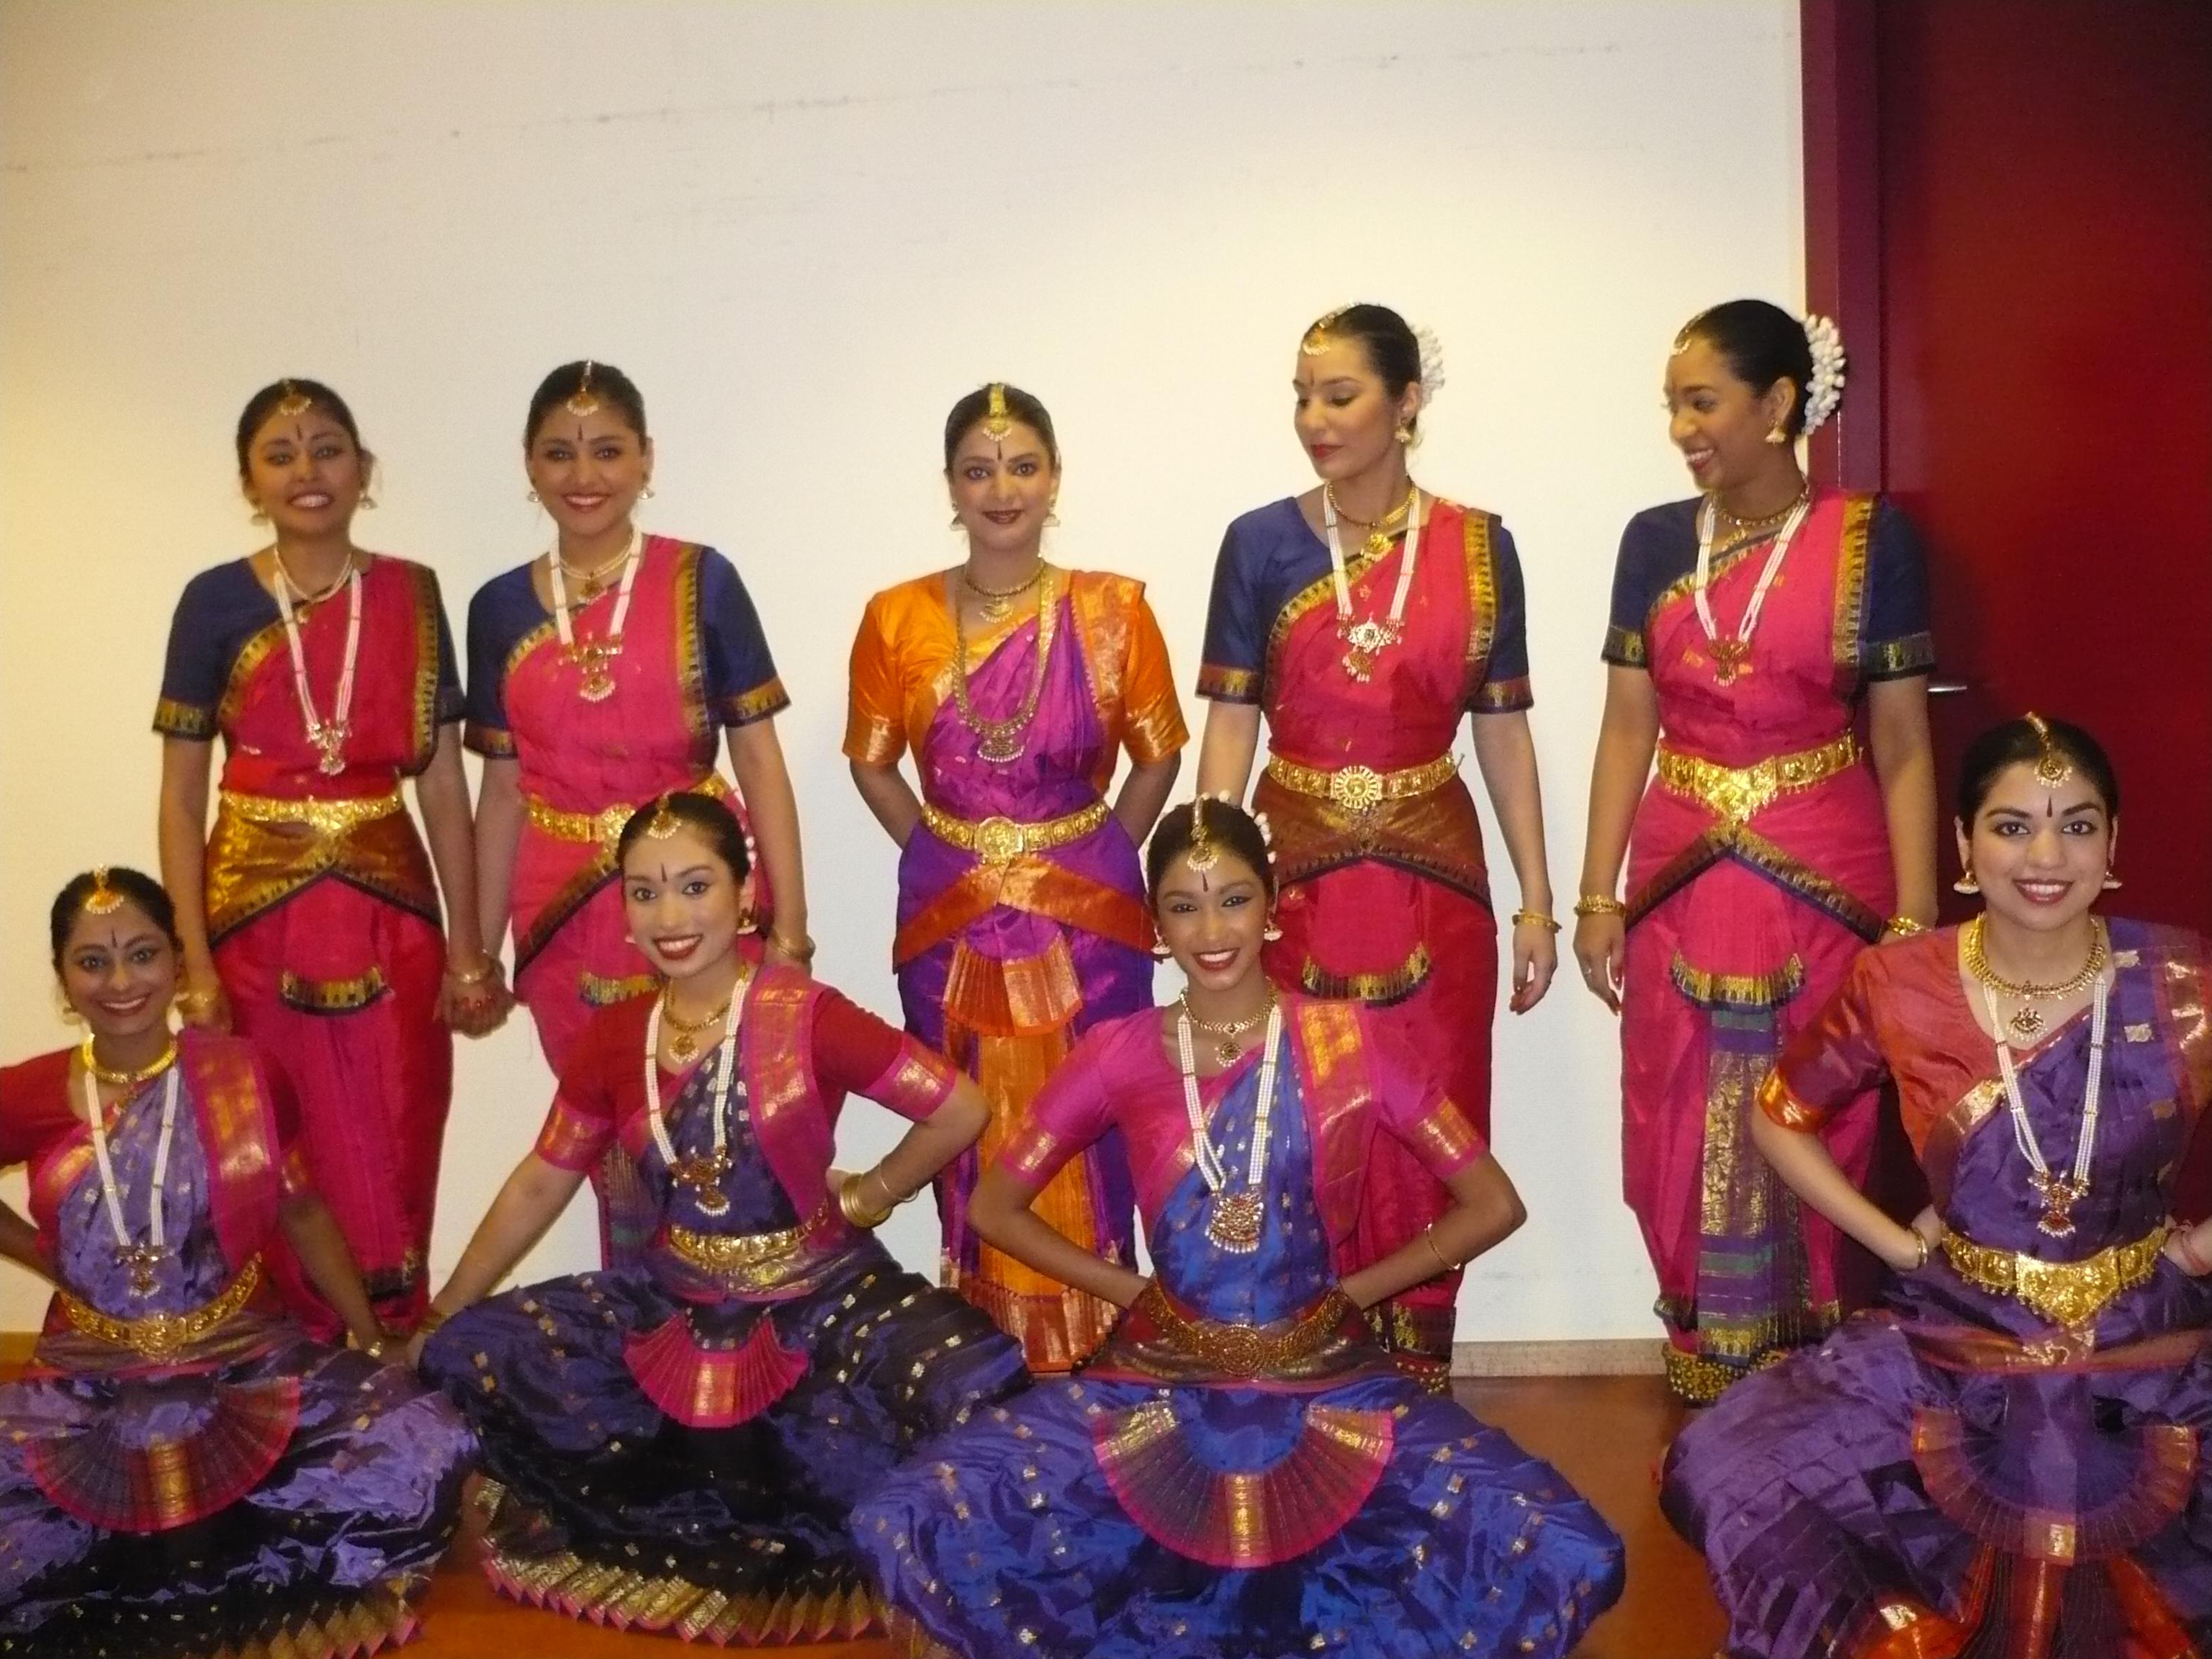 OHM Divali 2007